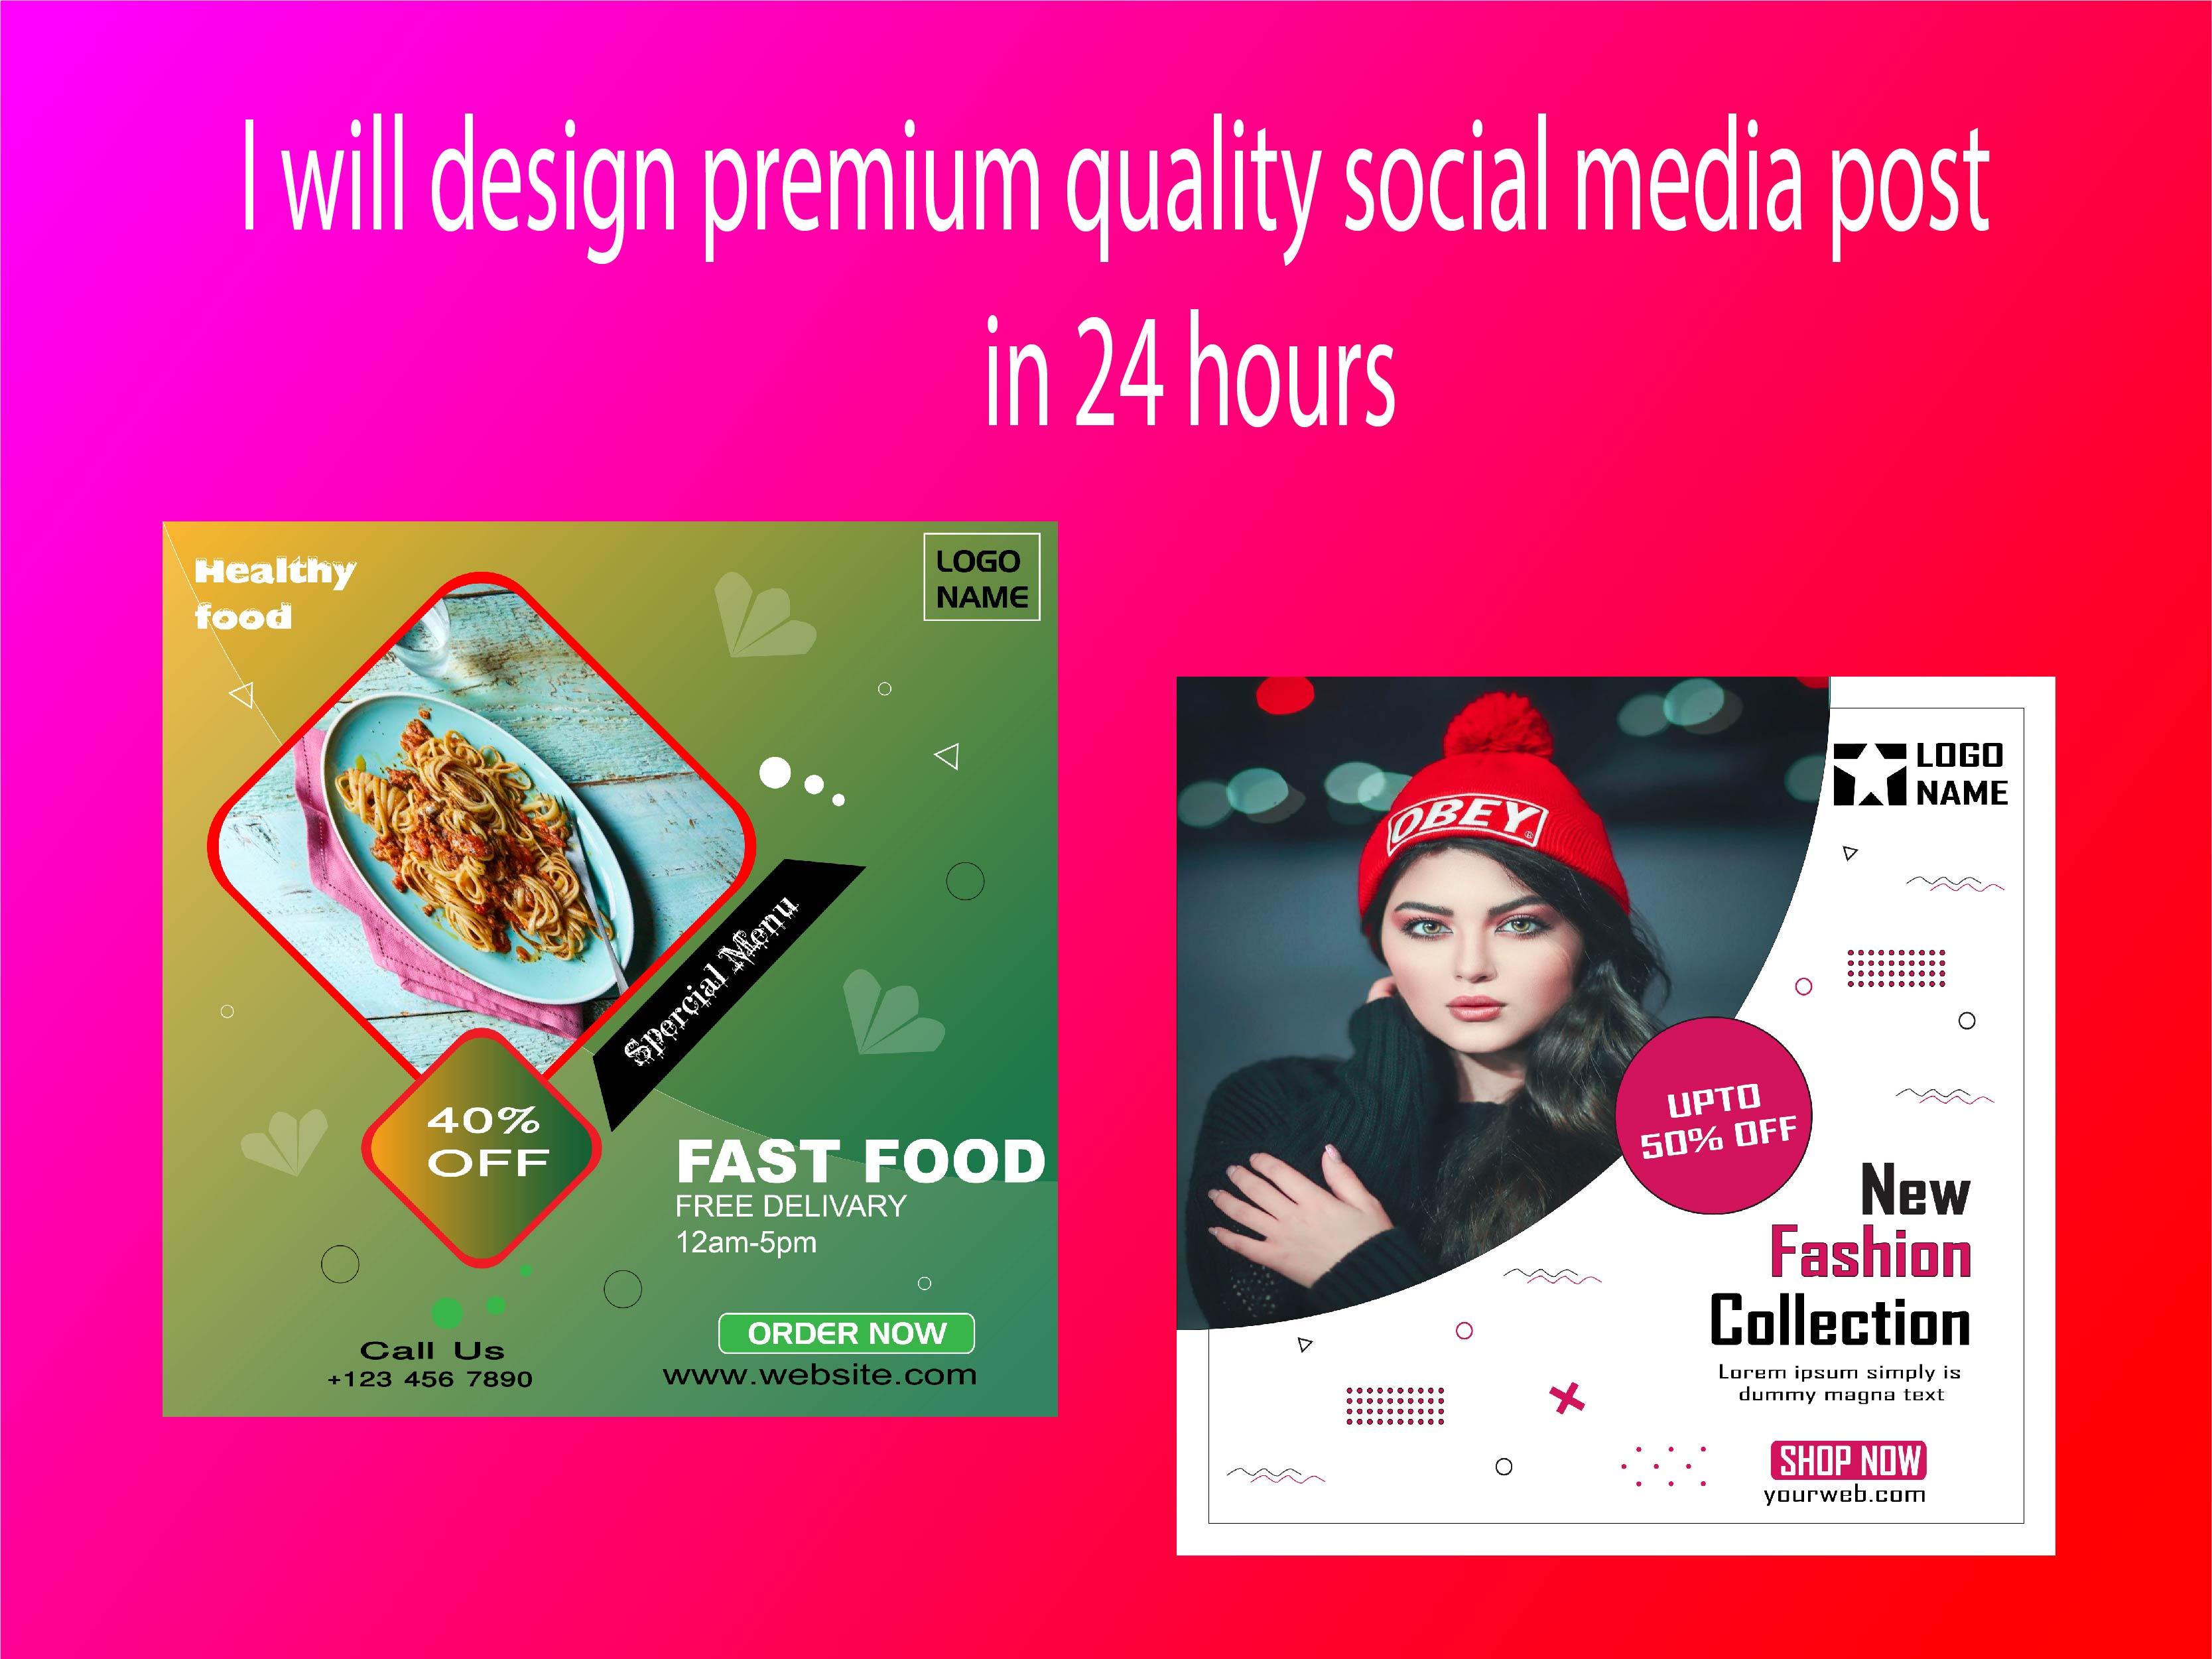 I will design premium quality social media post in 24 hours